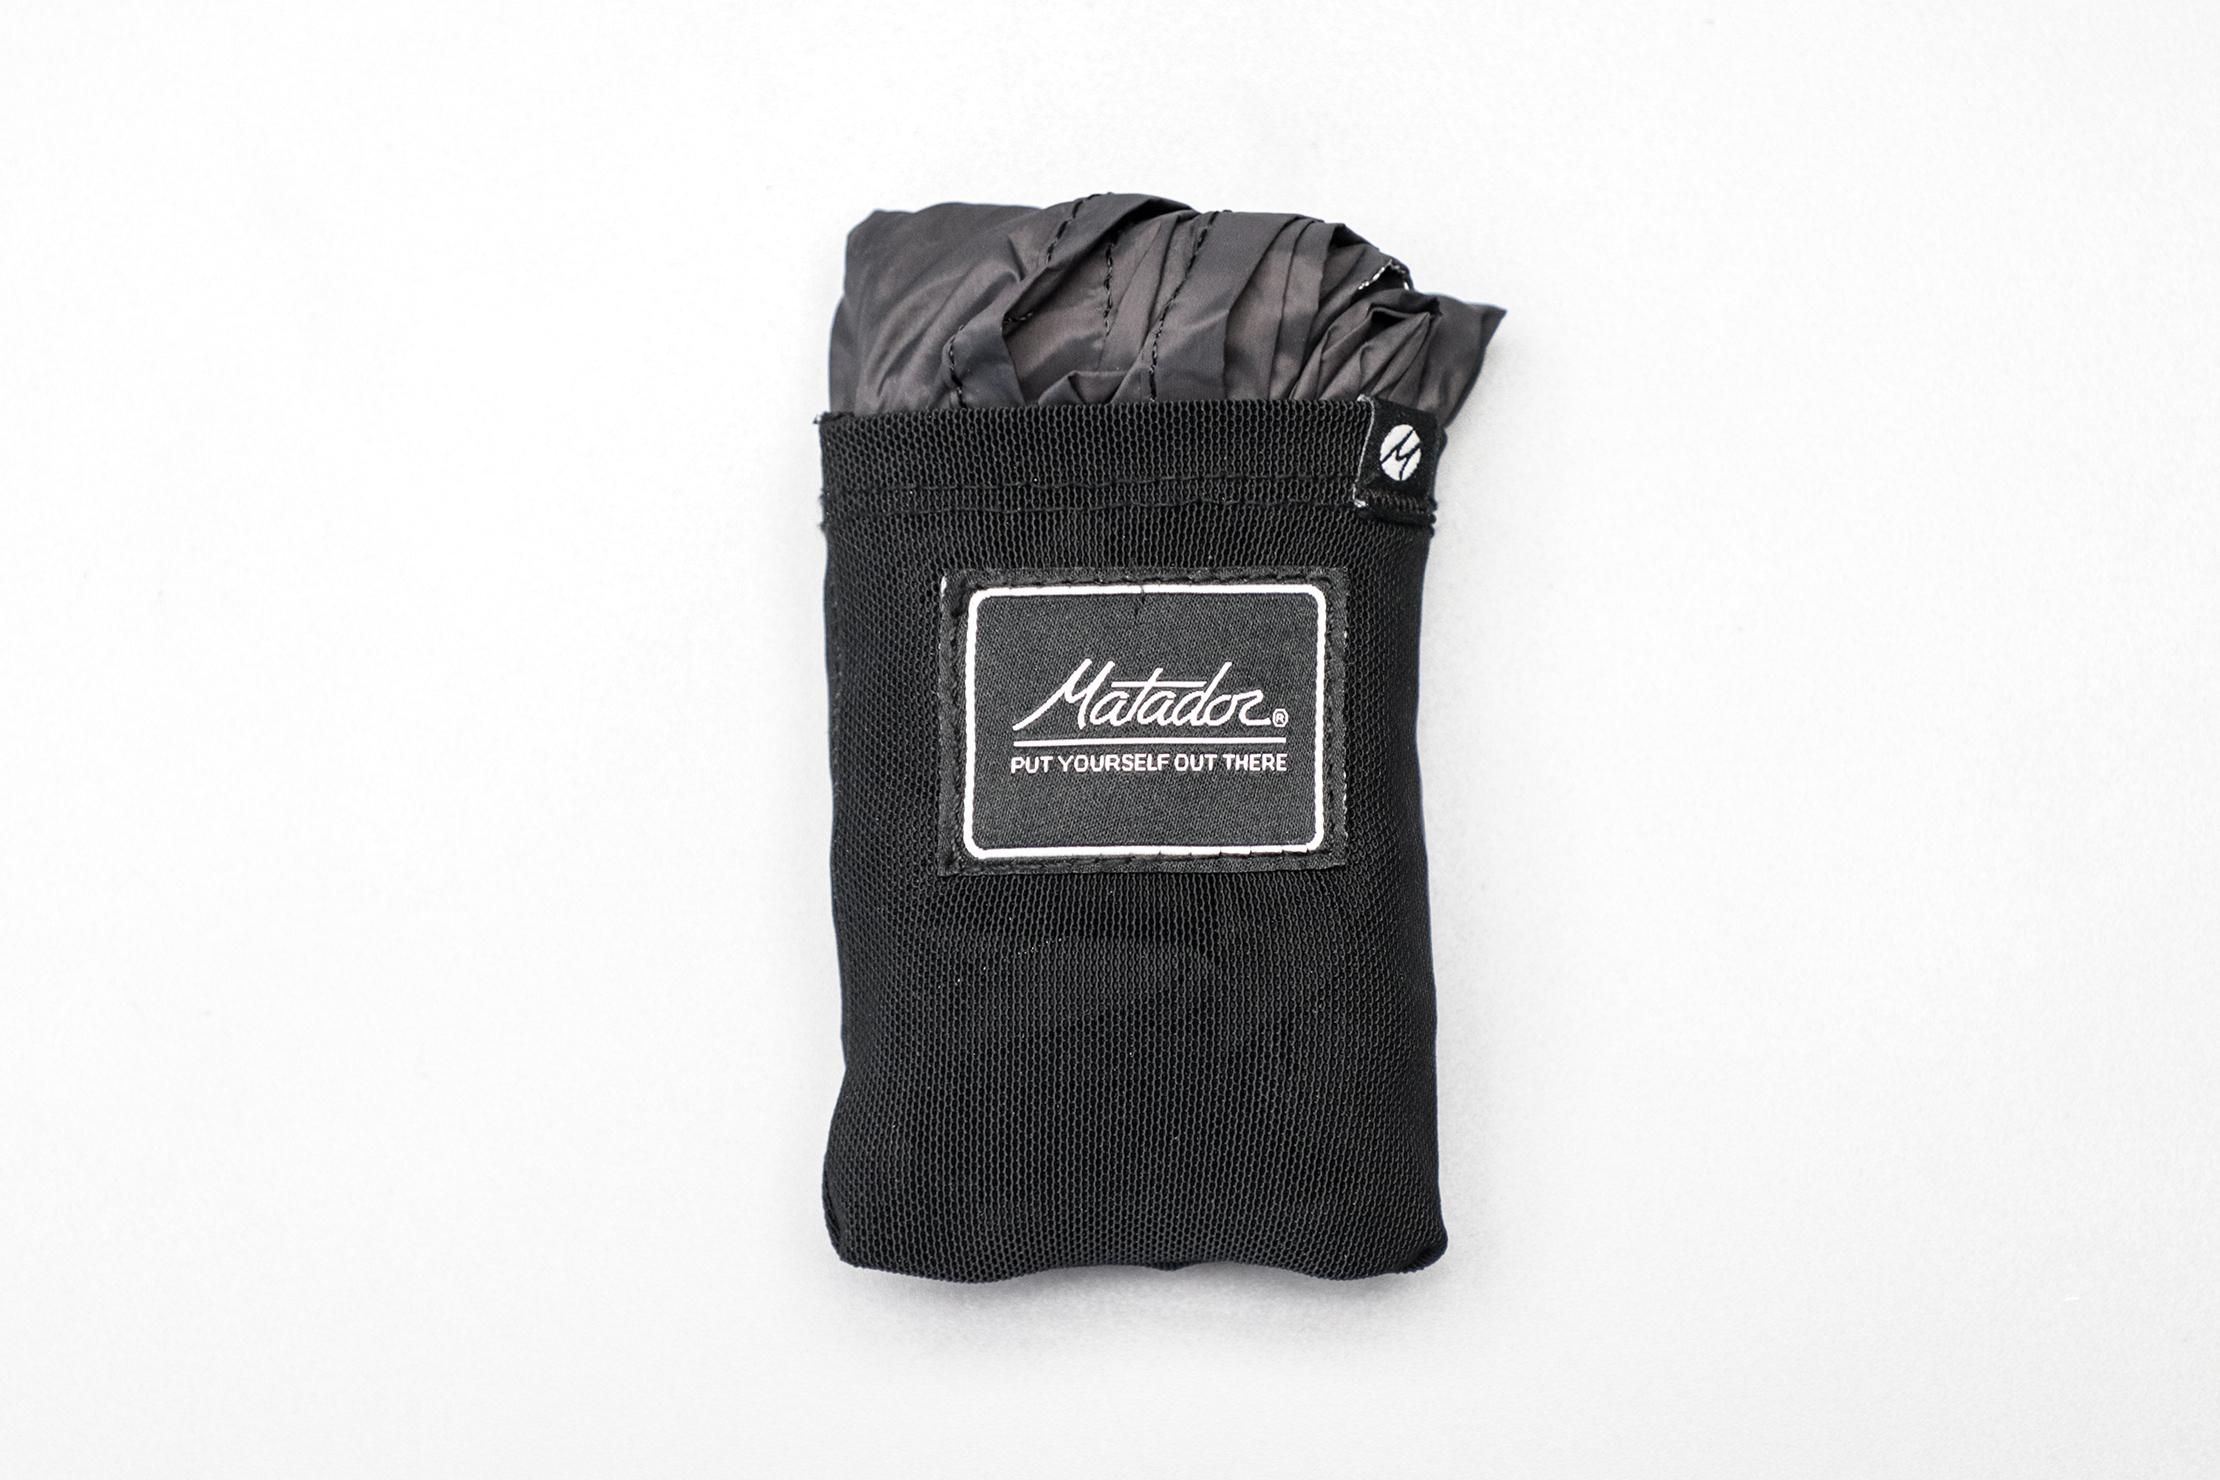 Matador Pocket Blanket 3.0 in pouch